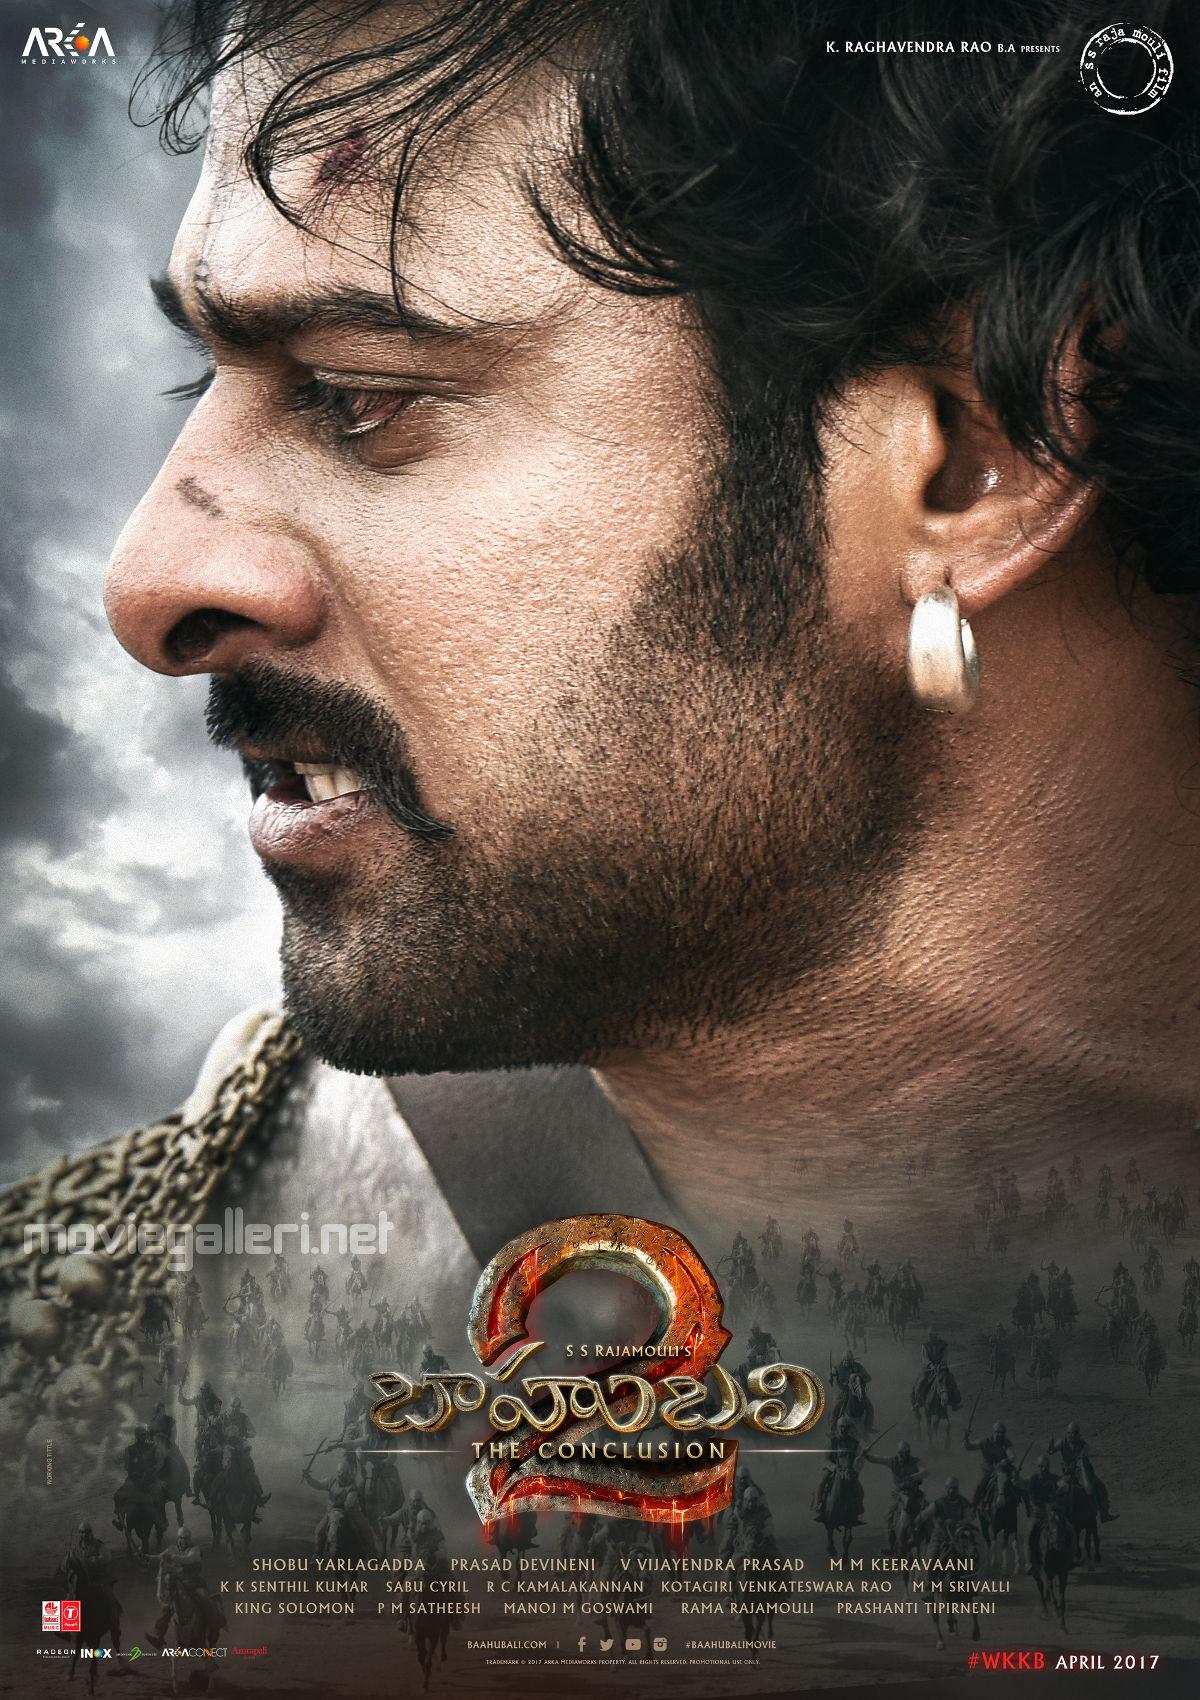 Prabhas Baahubali 2 Latest Poster New Movie Posters